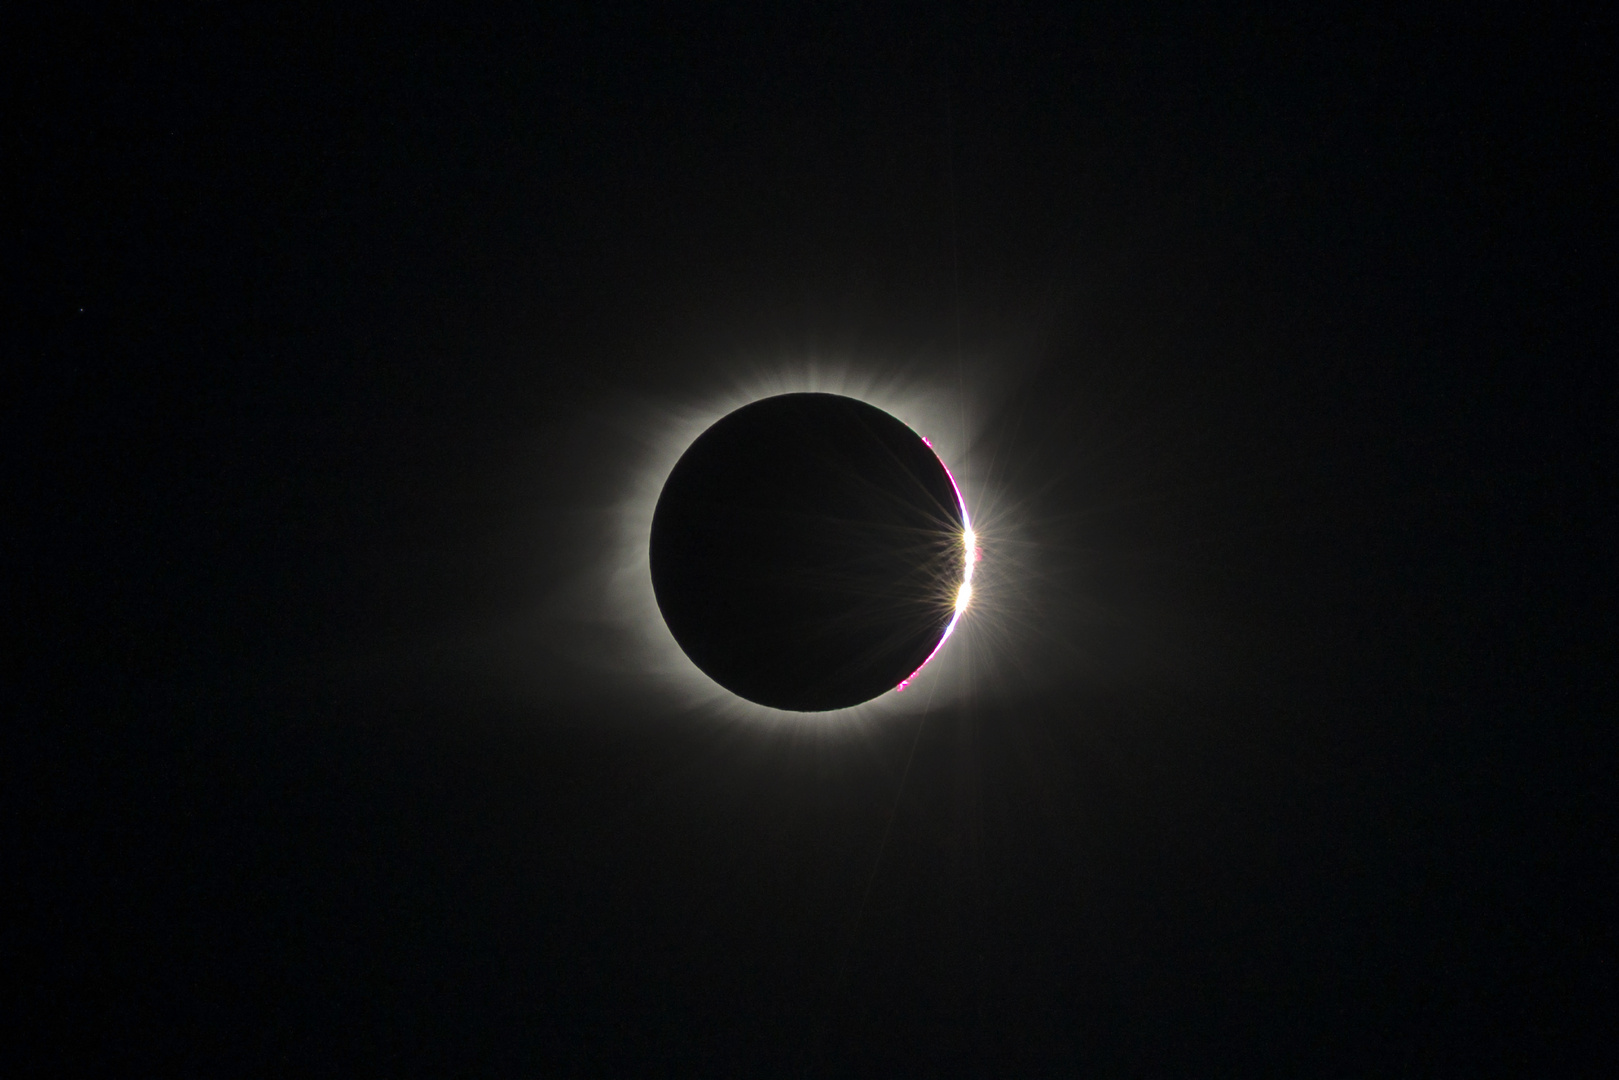 Totale Sonnenfinsternis USA 2017 II